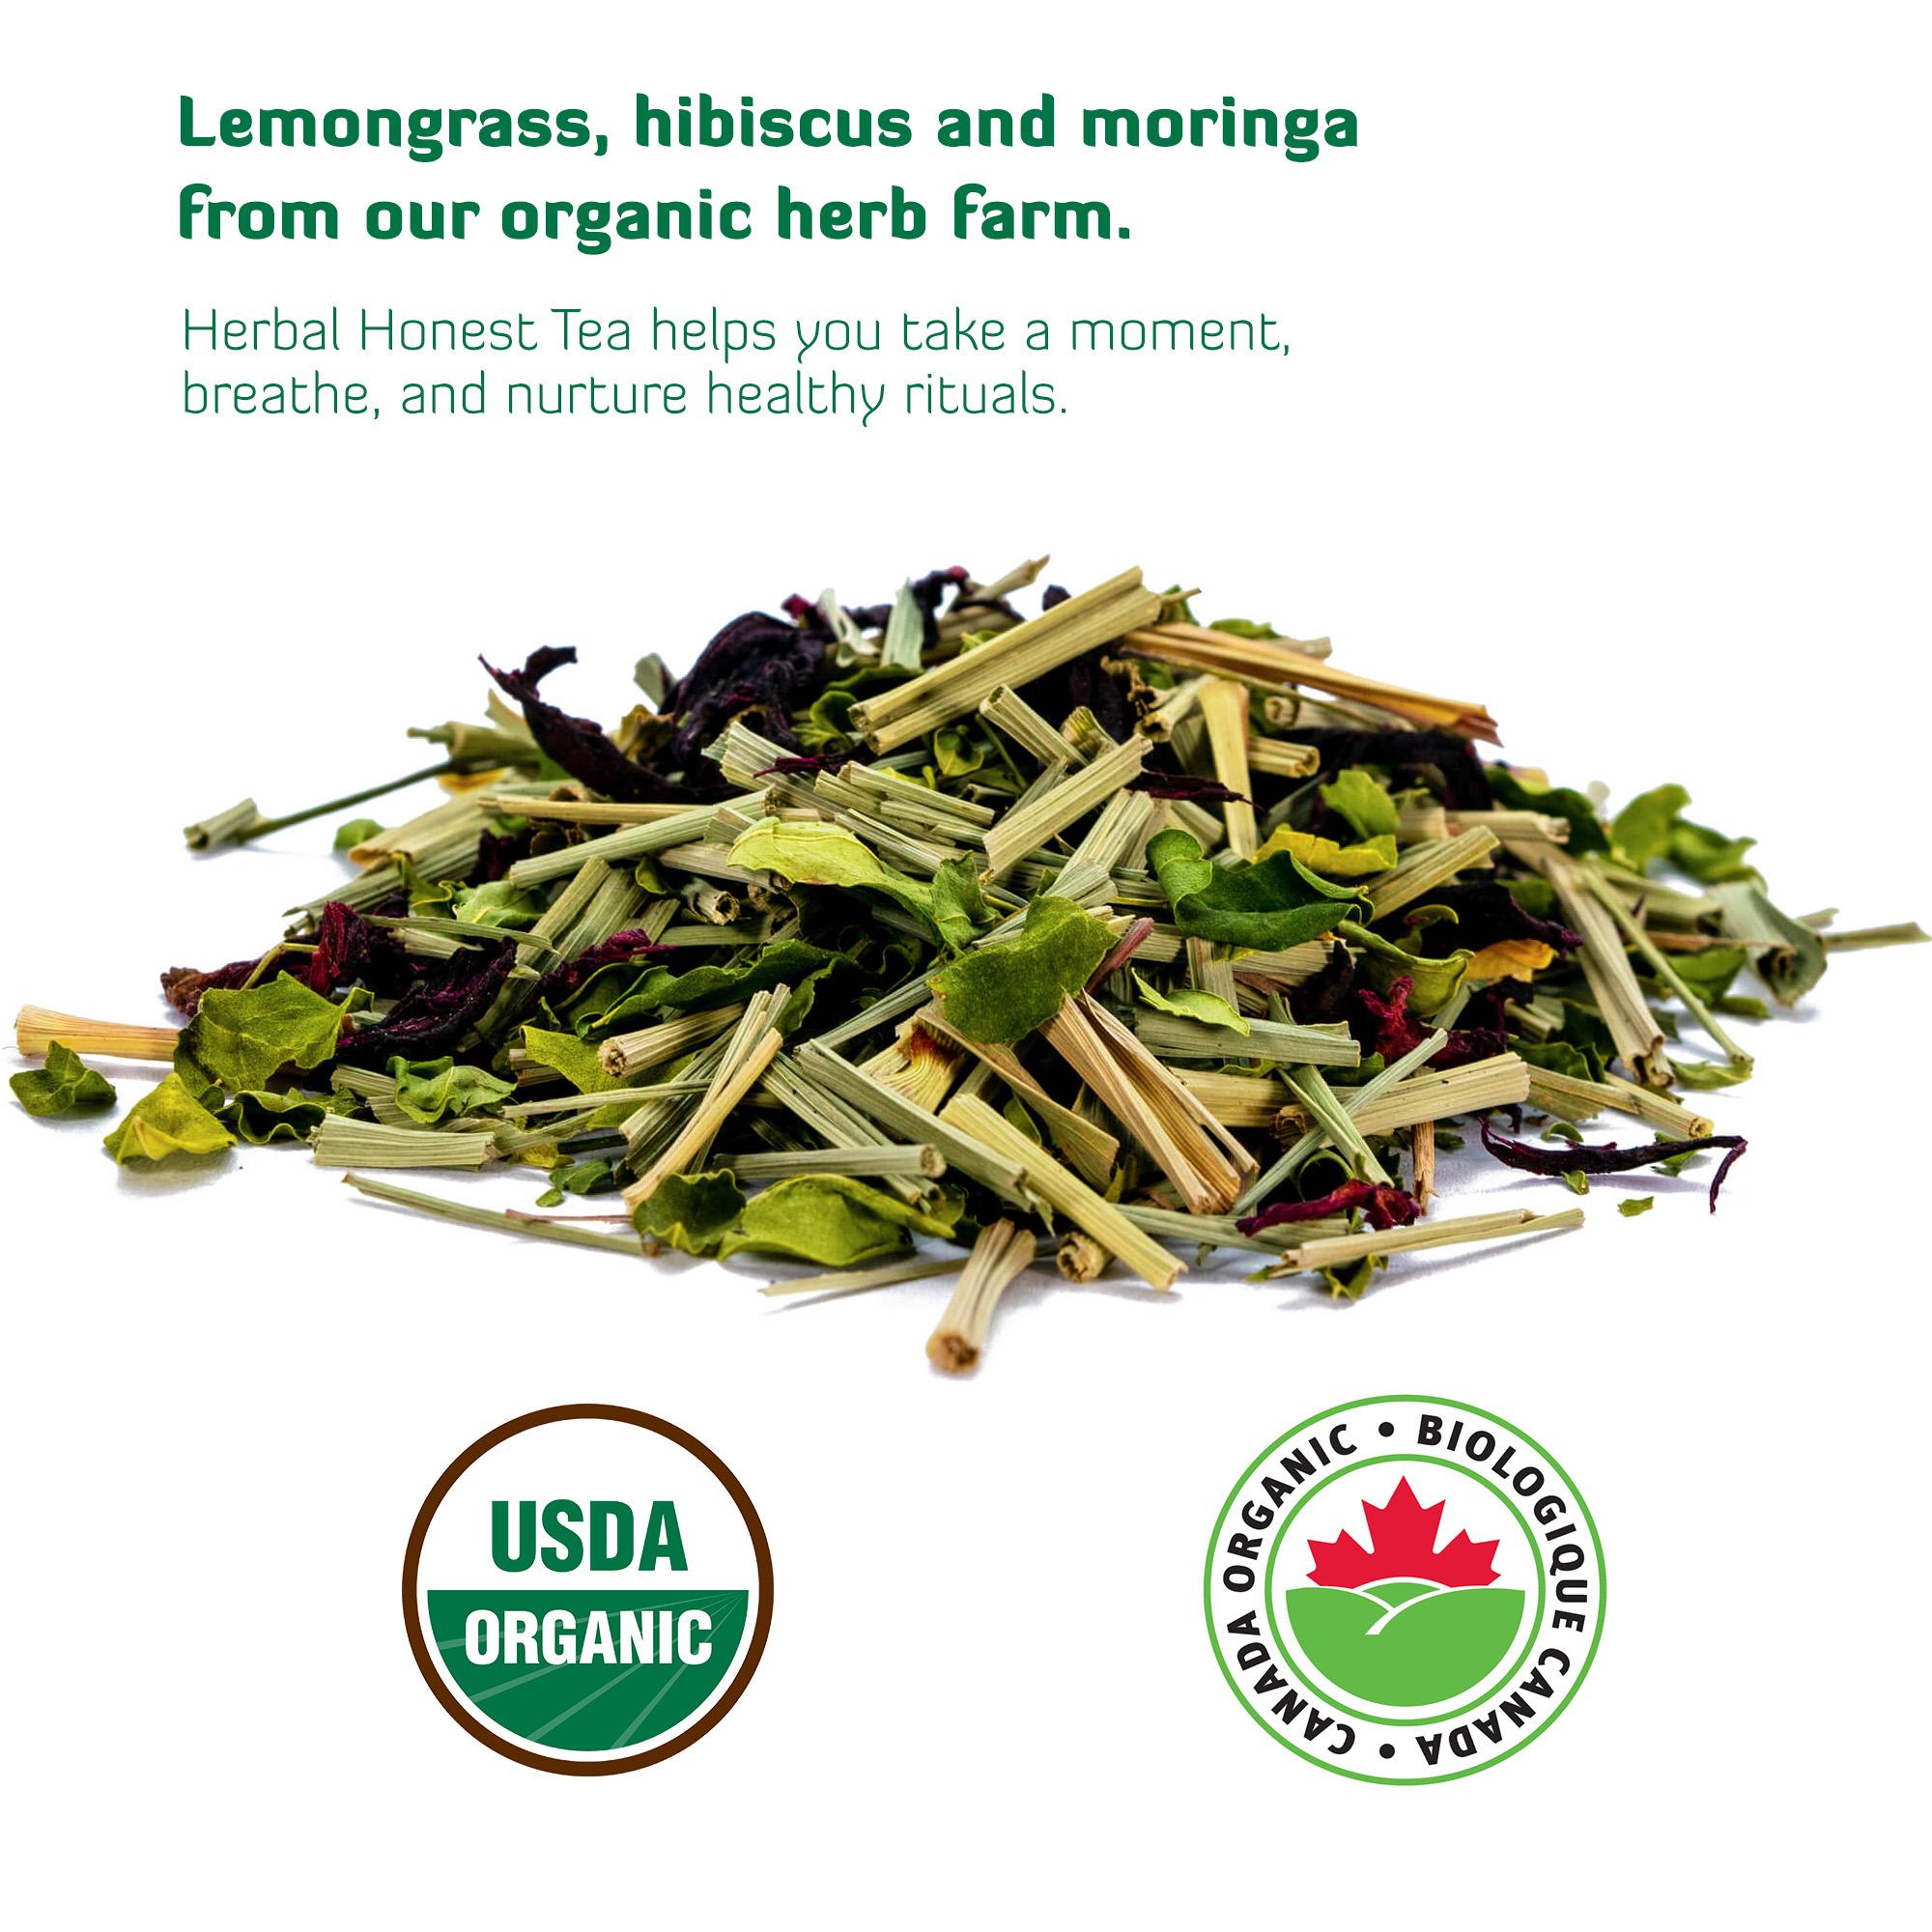 A pile of organic lemongrass, hibiscus, and moringa tea.